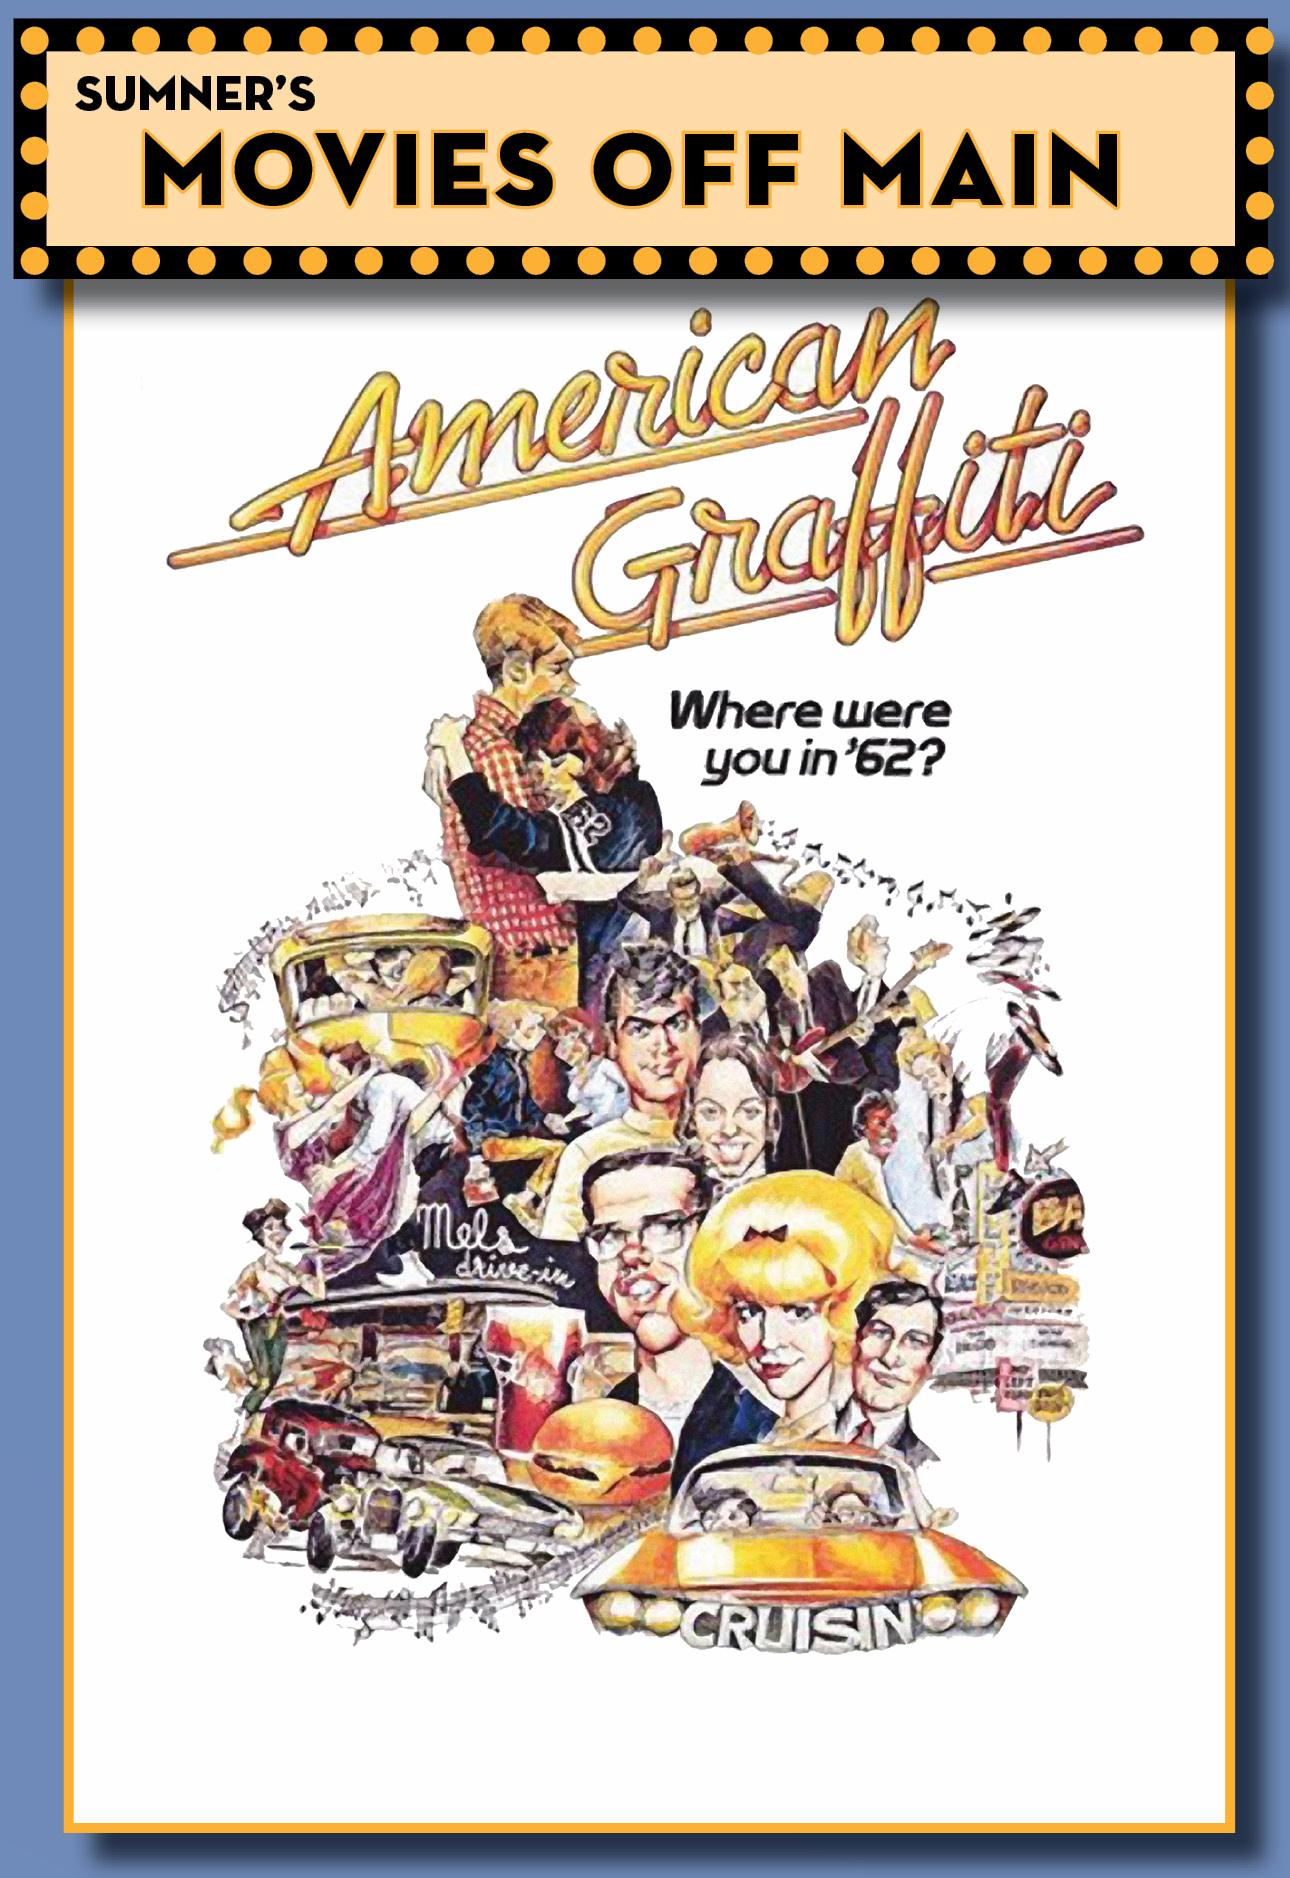 2017 movie AG